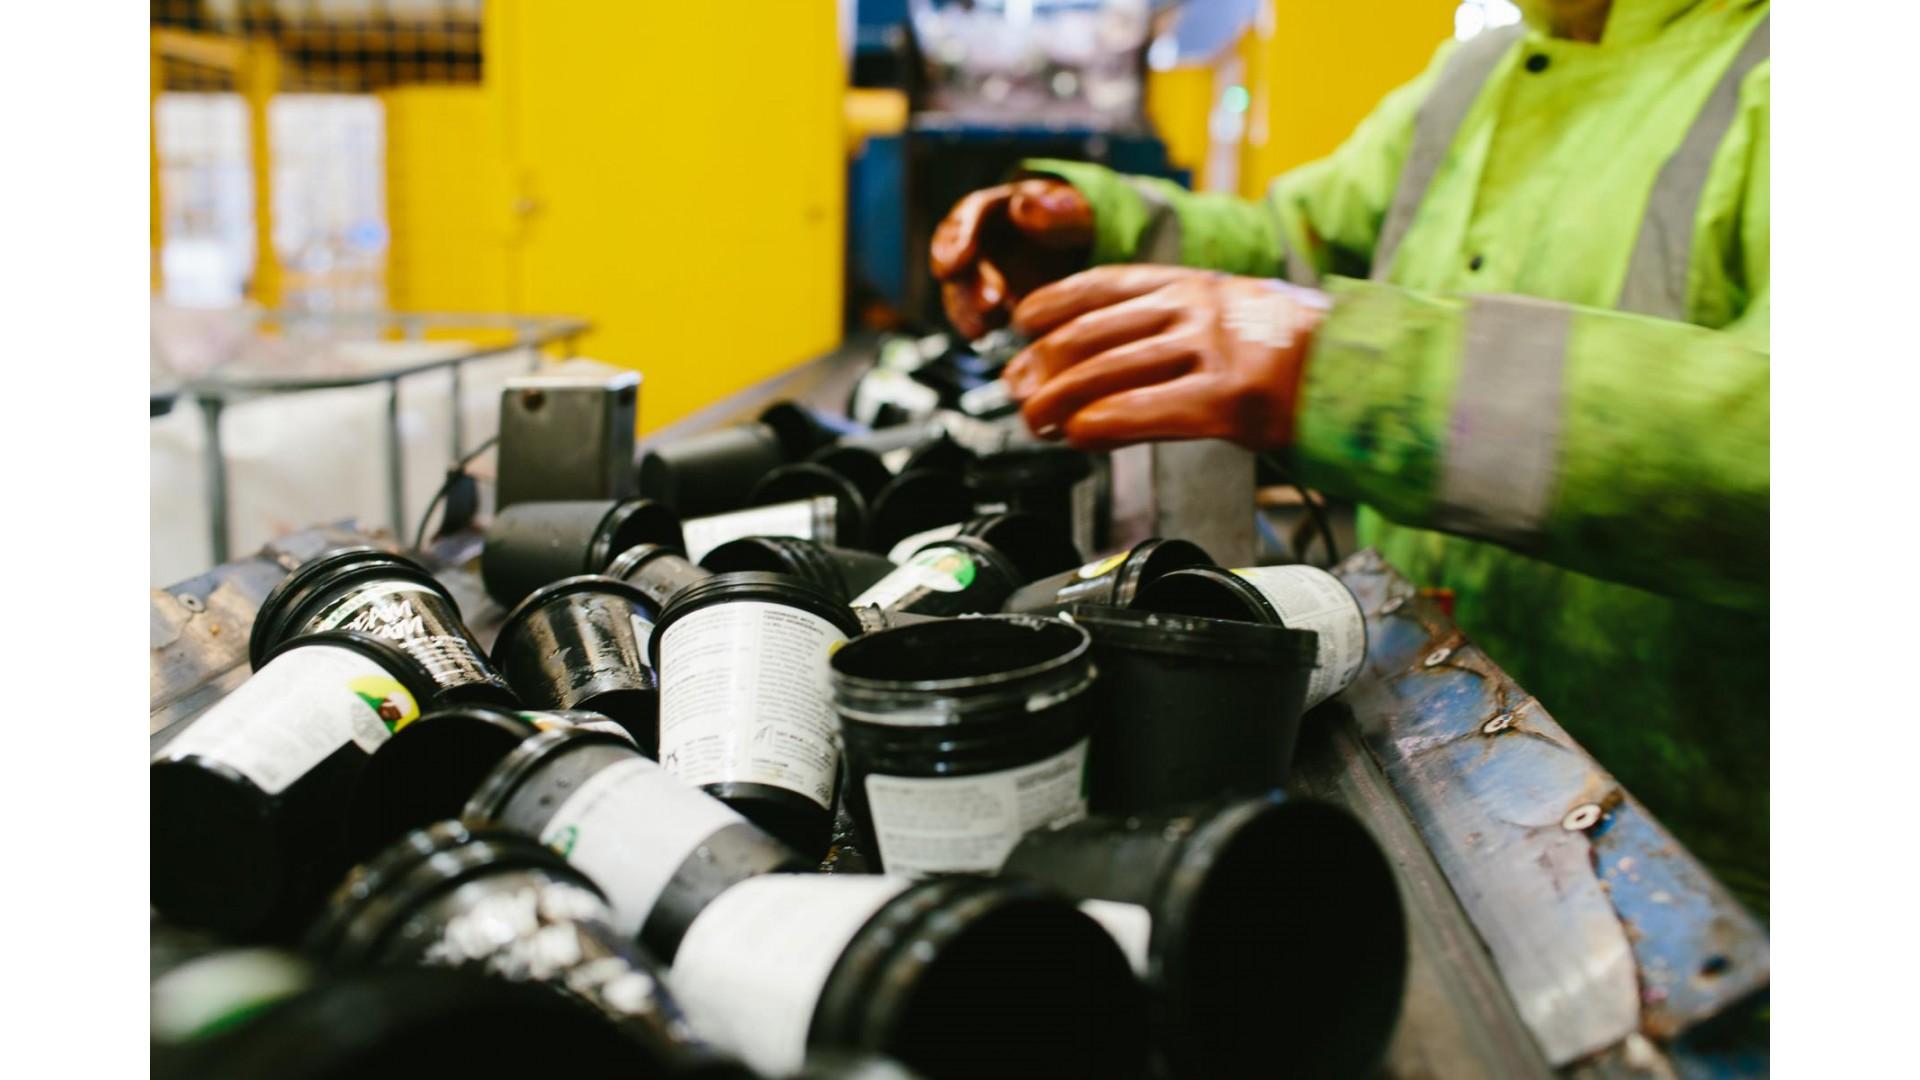 Recikliranje črnih posodic